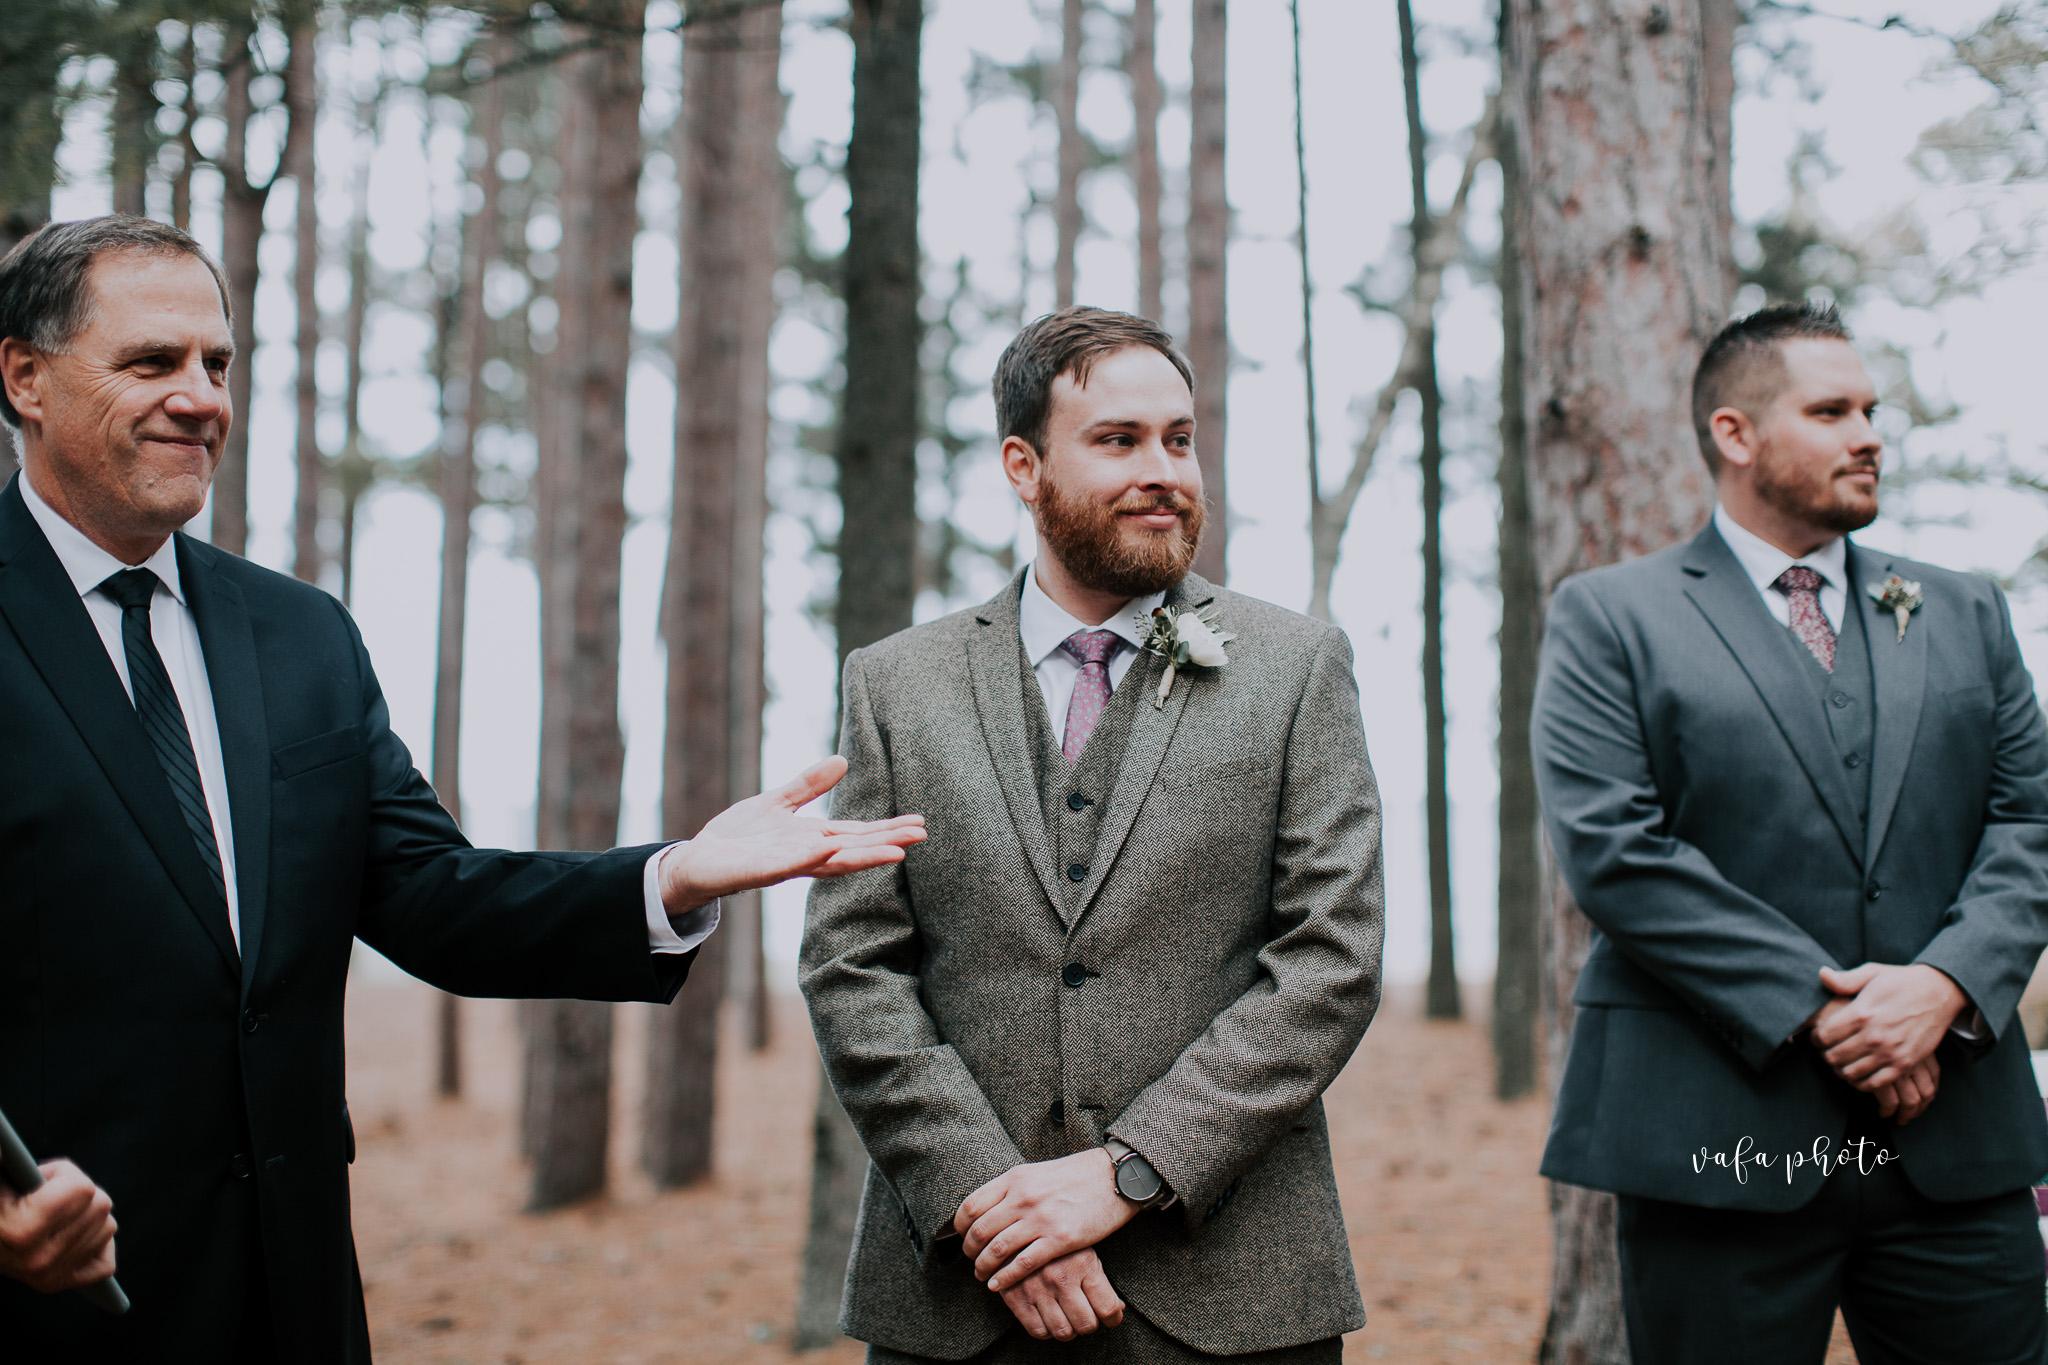 Little-Presque-Isle-Michigan-Wedding-Kim-Kyle-Vafa-Photo-188.jpg